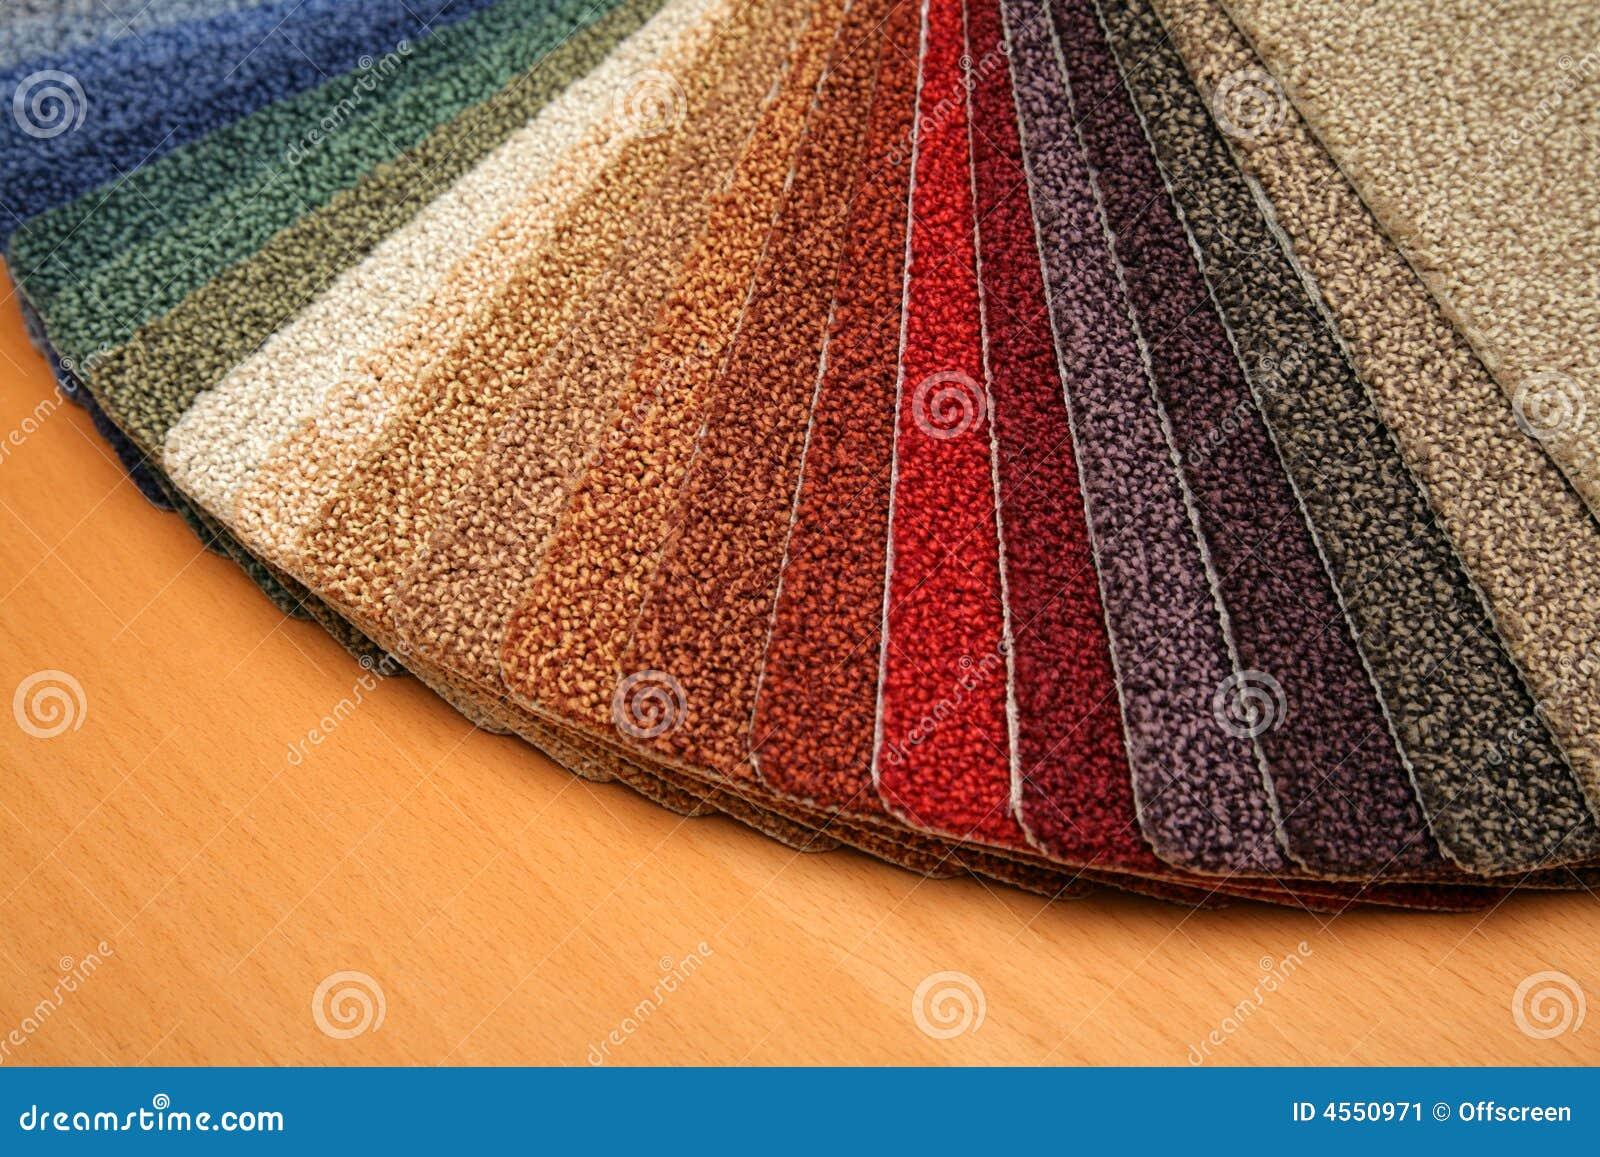 Carpet samples stock image. Image of sample, wool, sale